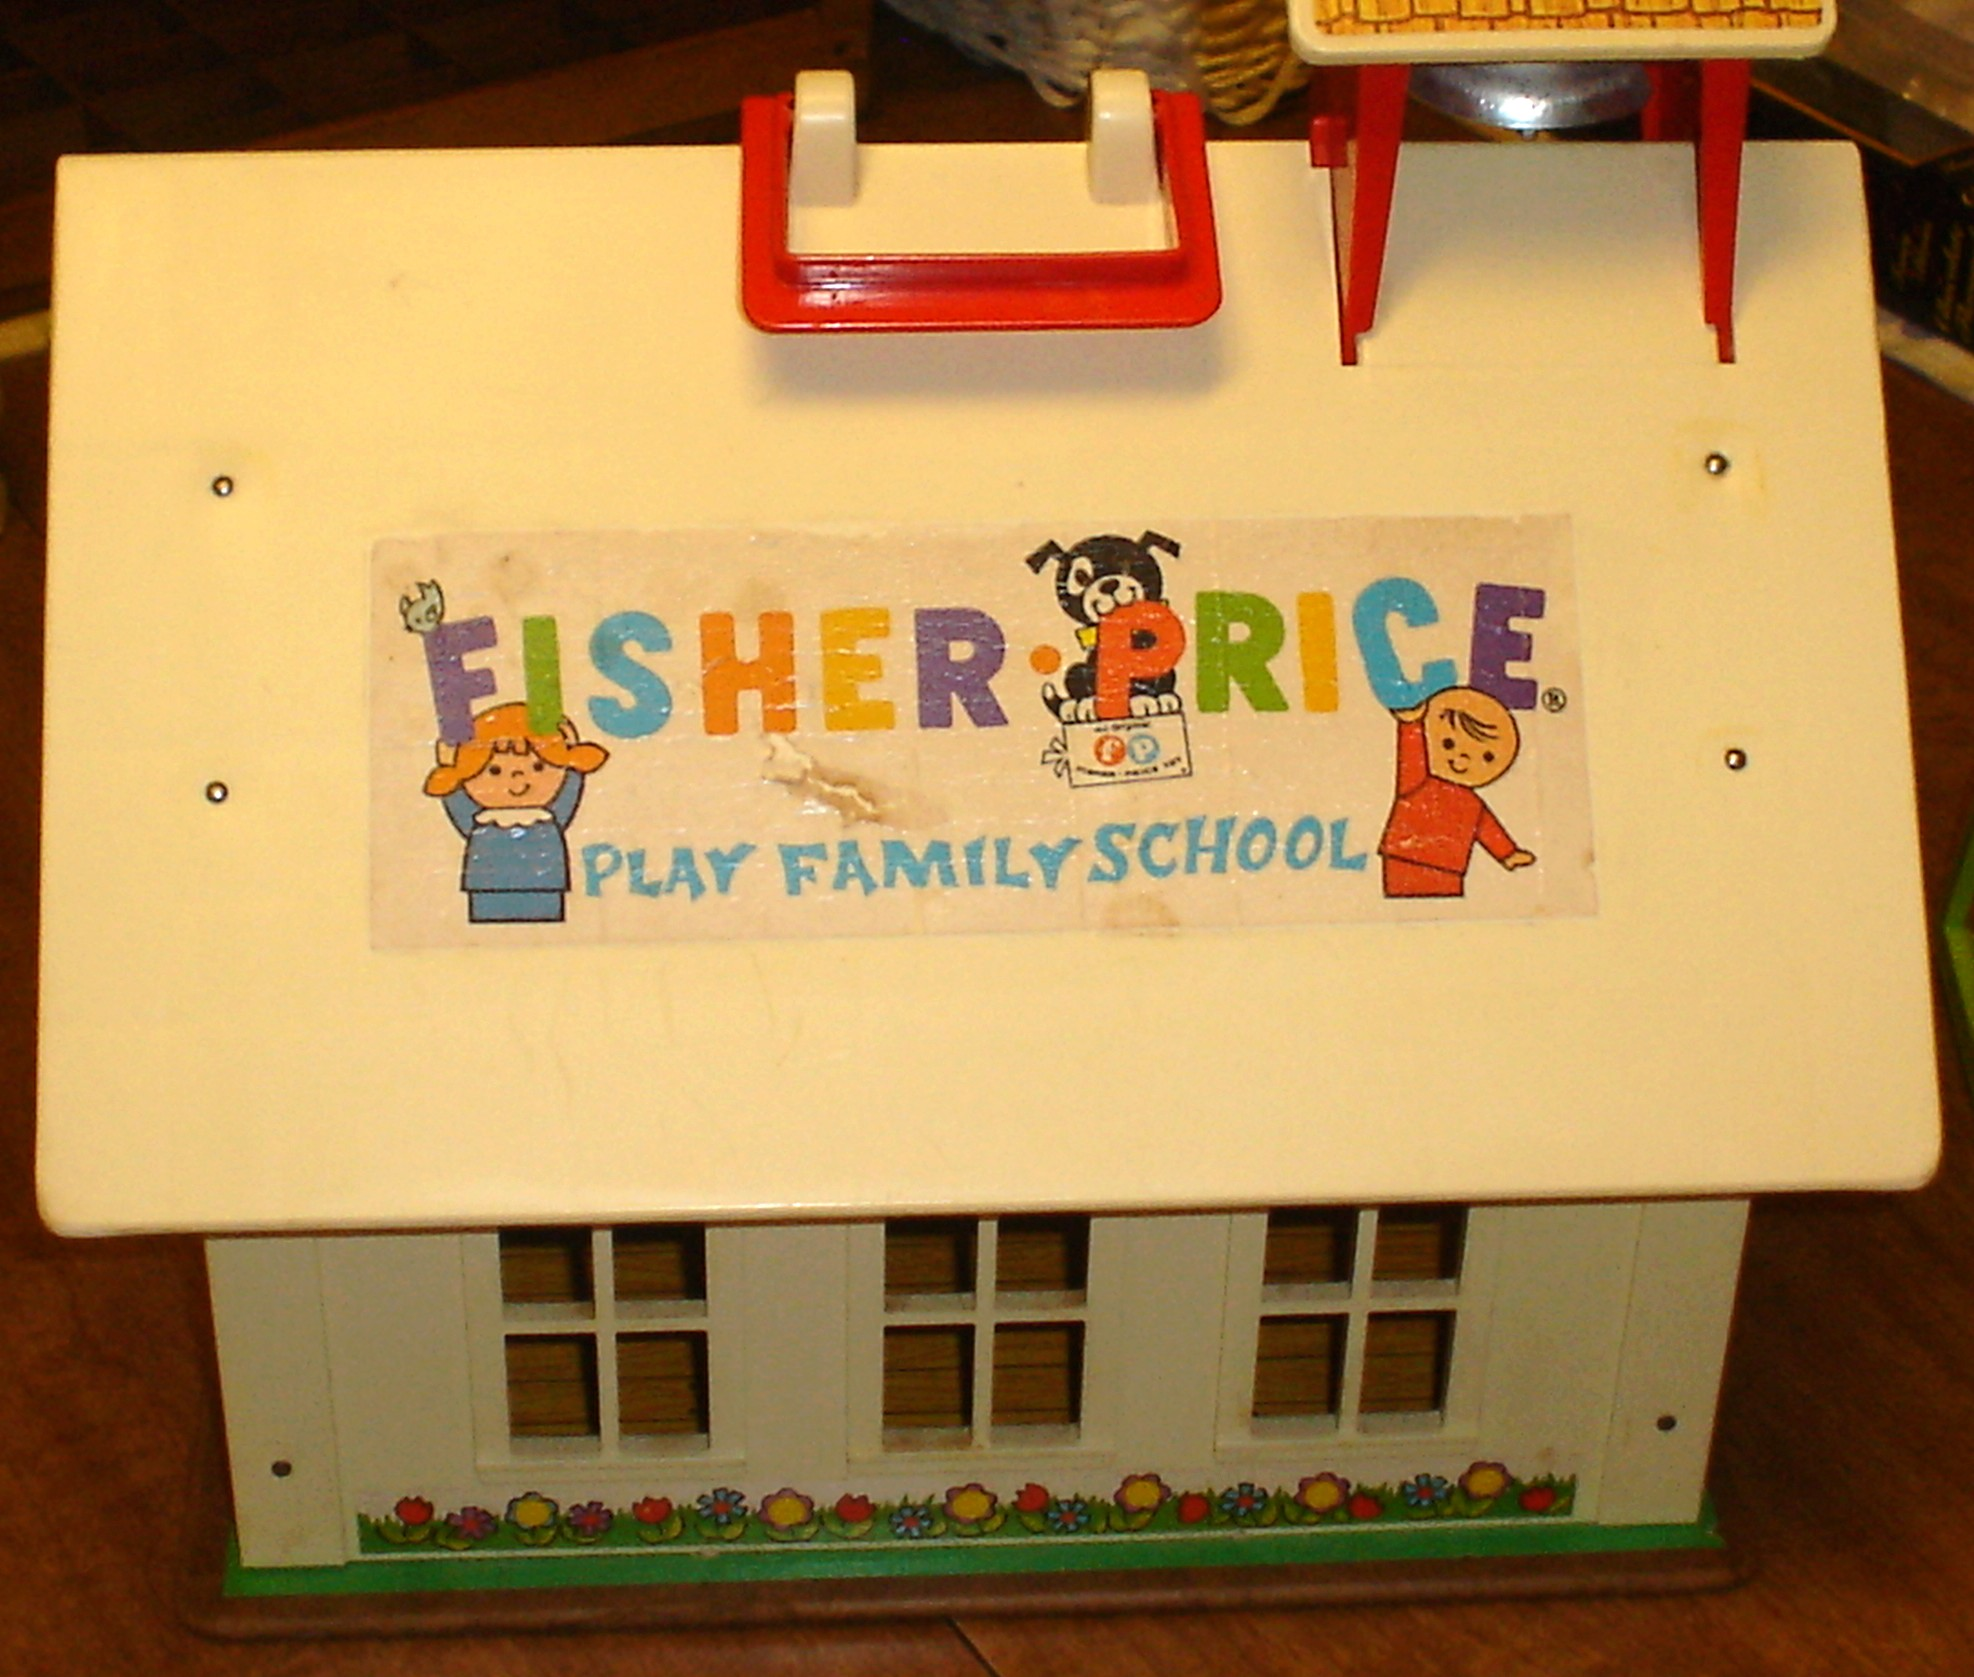 fisher price store: